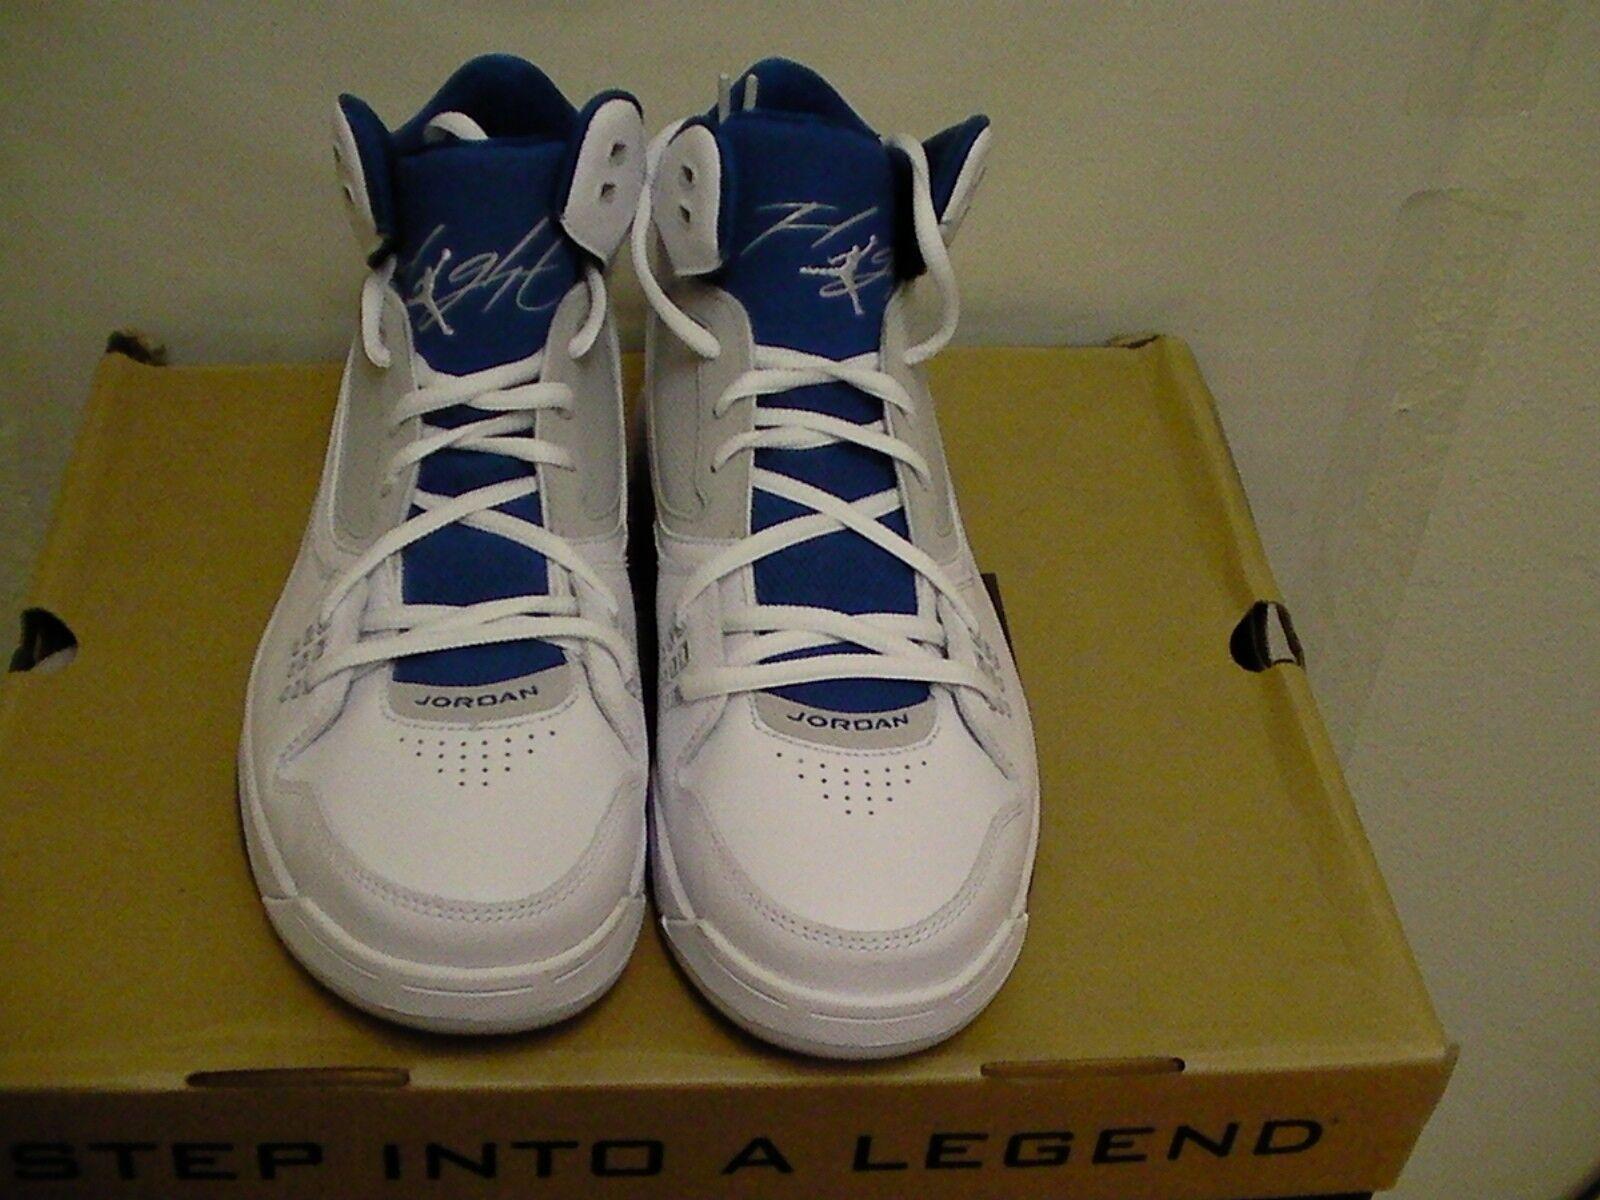 Jordan flight 23 (GS) shoes size 5.5 Youth new